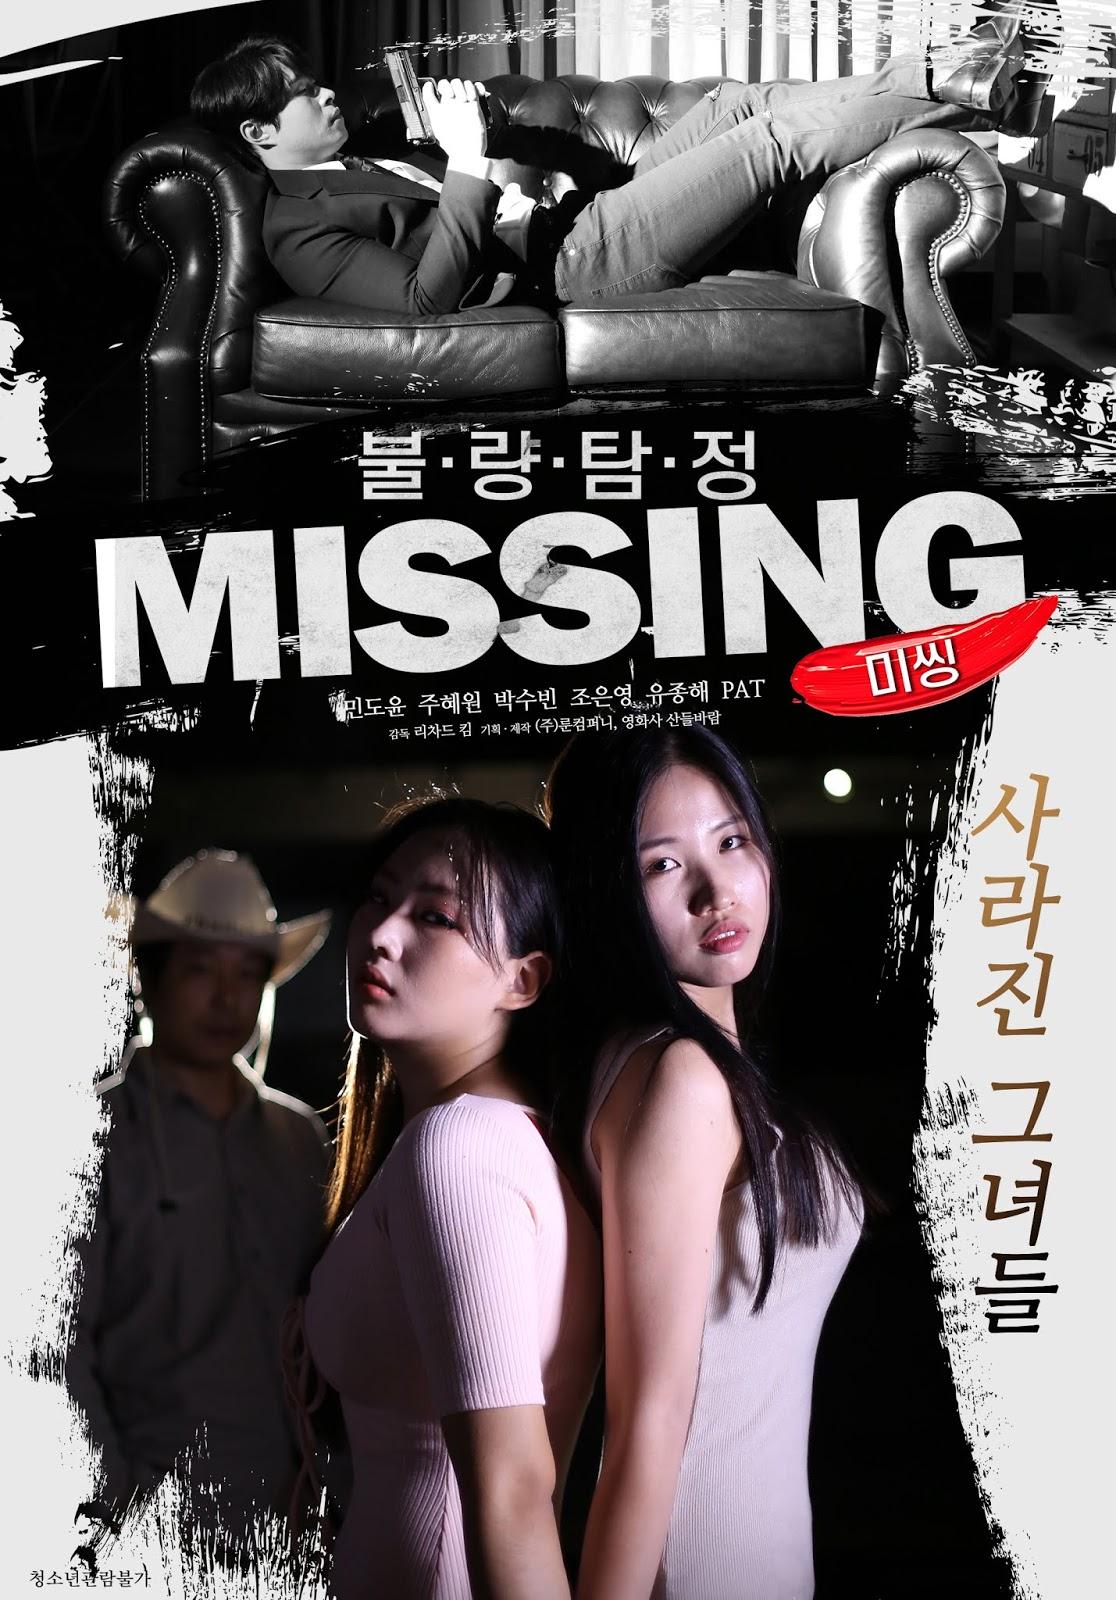 Bad Detective Missing Full Korea 18+ Adult Movie Online Free